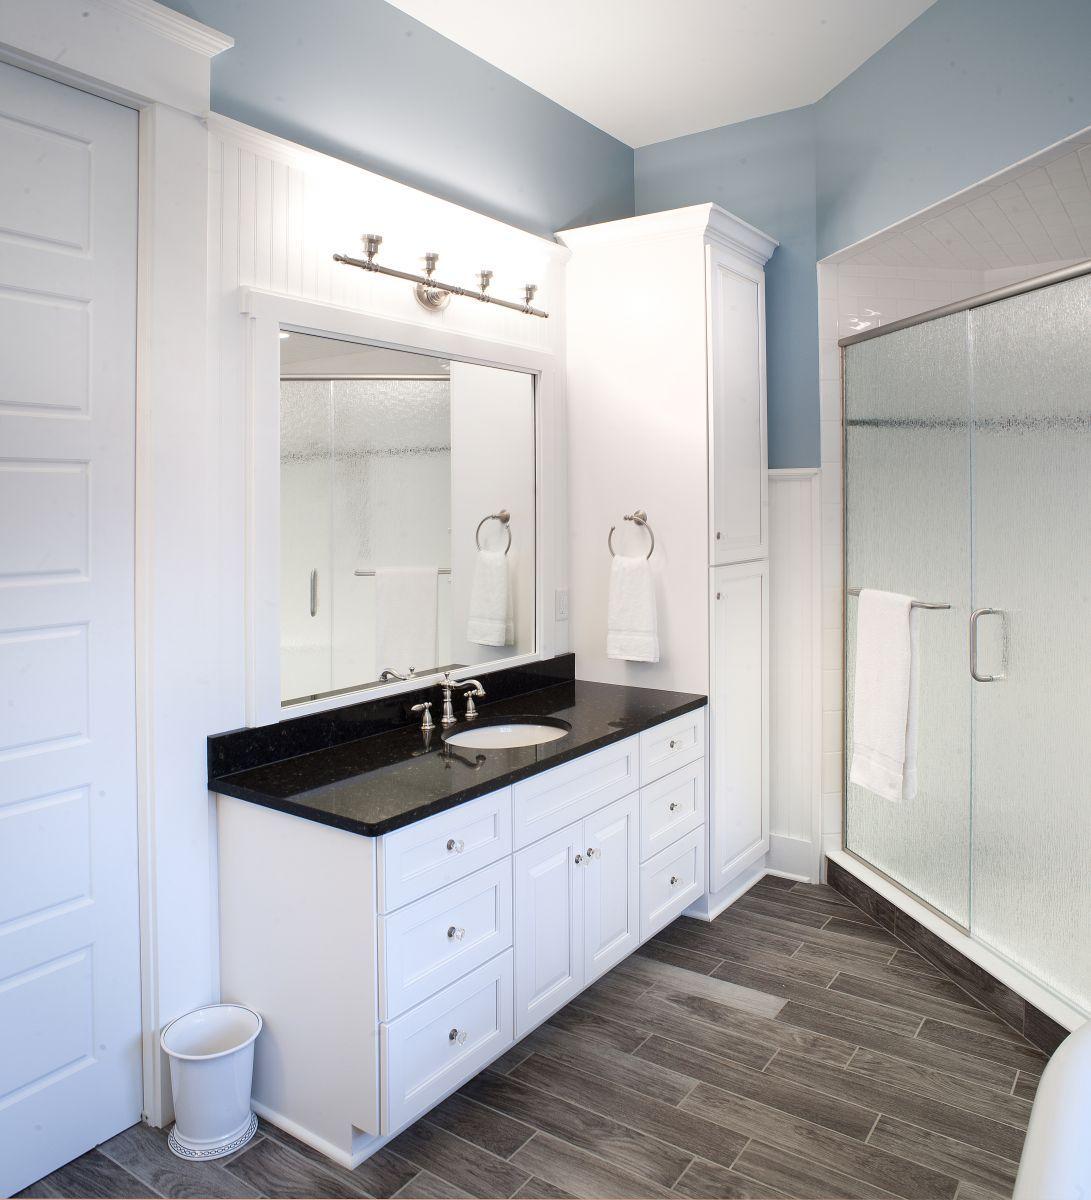 Modern Bath With Vanity Linen Cabinet White Cabinetry Pinterest Modern Baths Linen